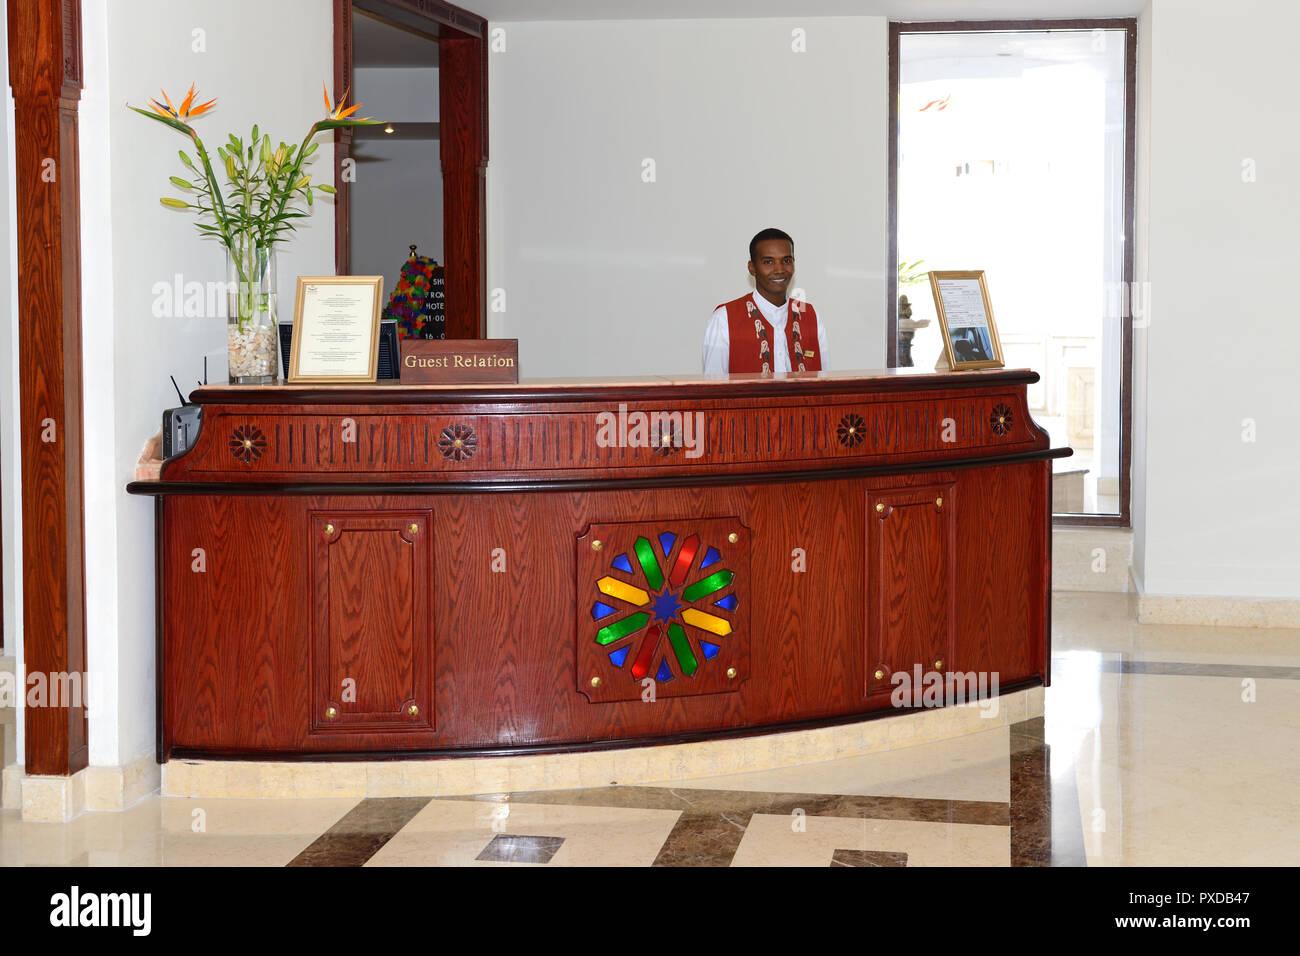 SHARM EL SHEIKH, EGYPT -  NOVEMBER 28: The lobby of Baron Palms luxury hotel and smiling receptionists on November 28, 2012 in Sharm el Sheikh, Egypt. - Stock Image